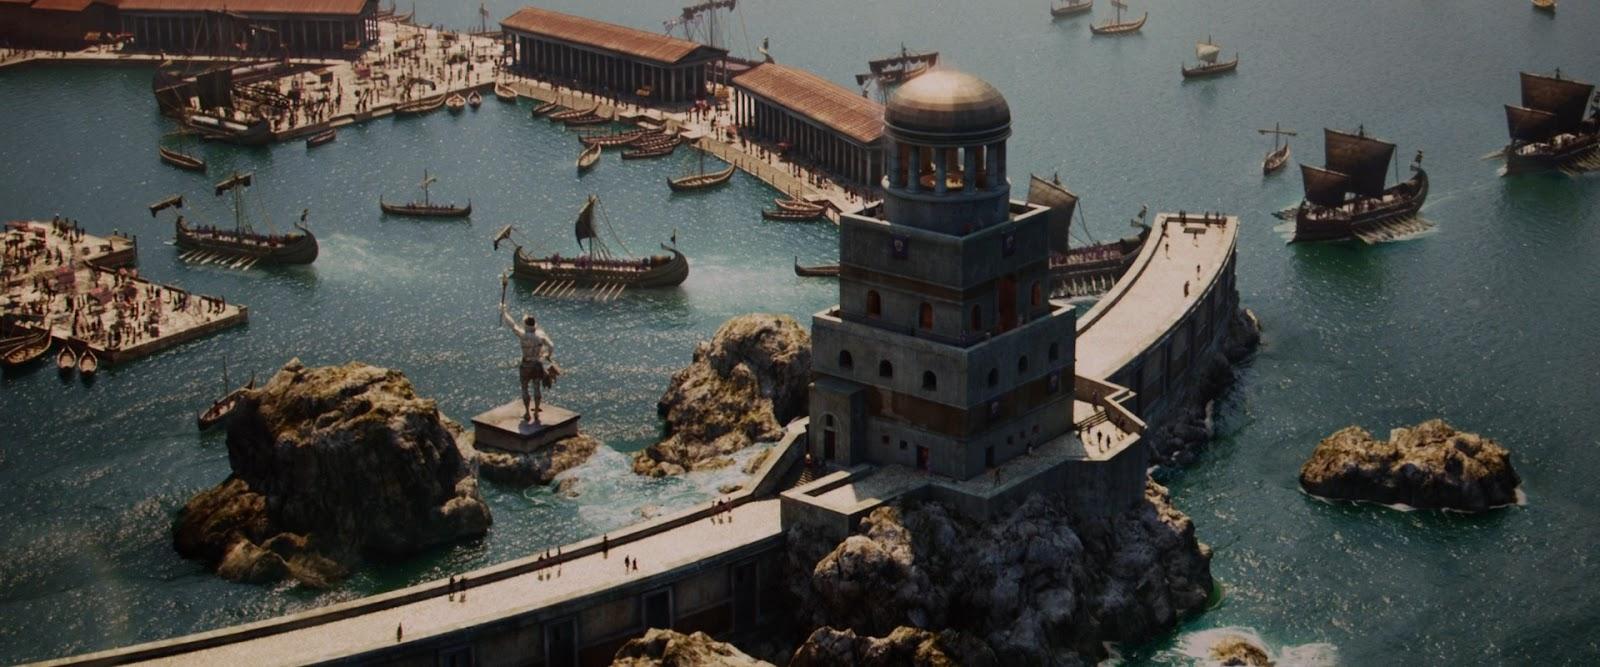 Pompeii (2014) 3